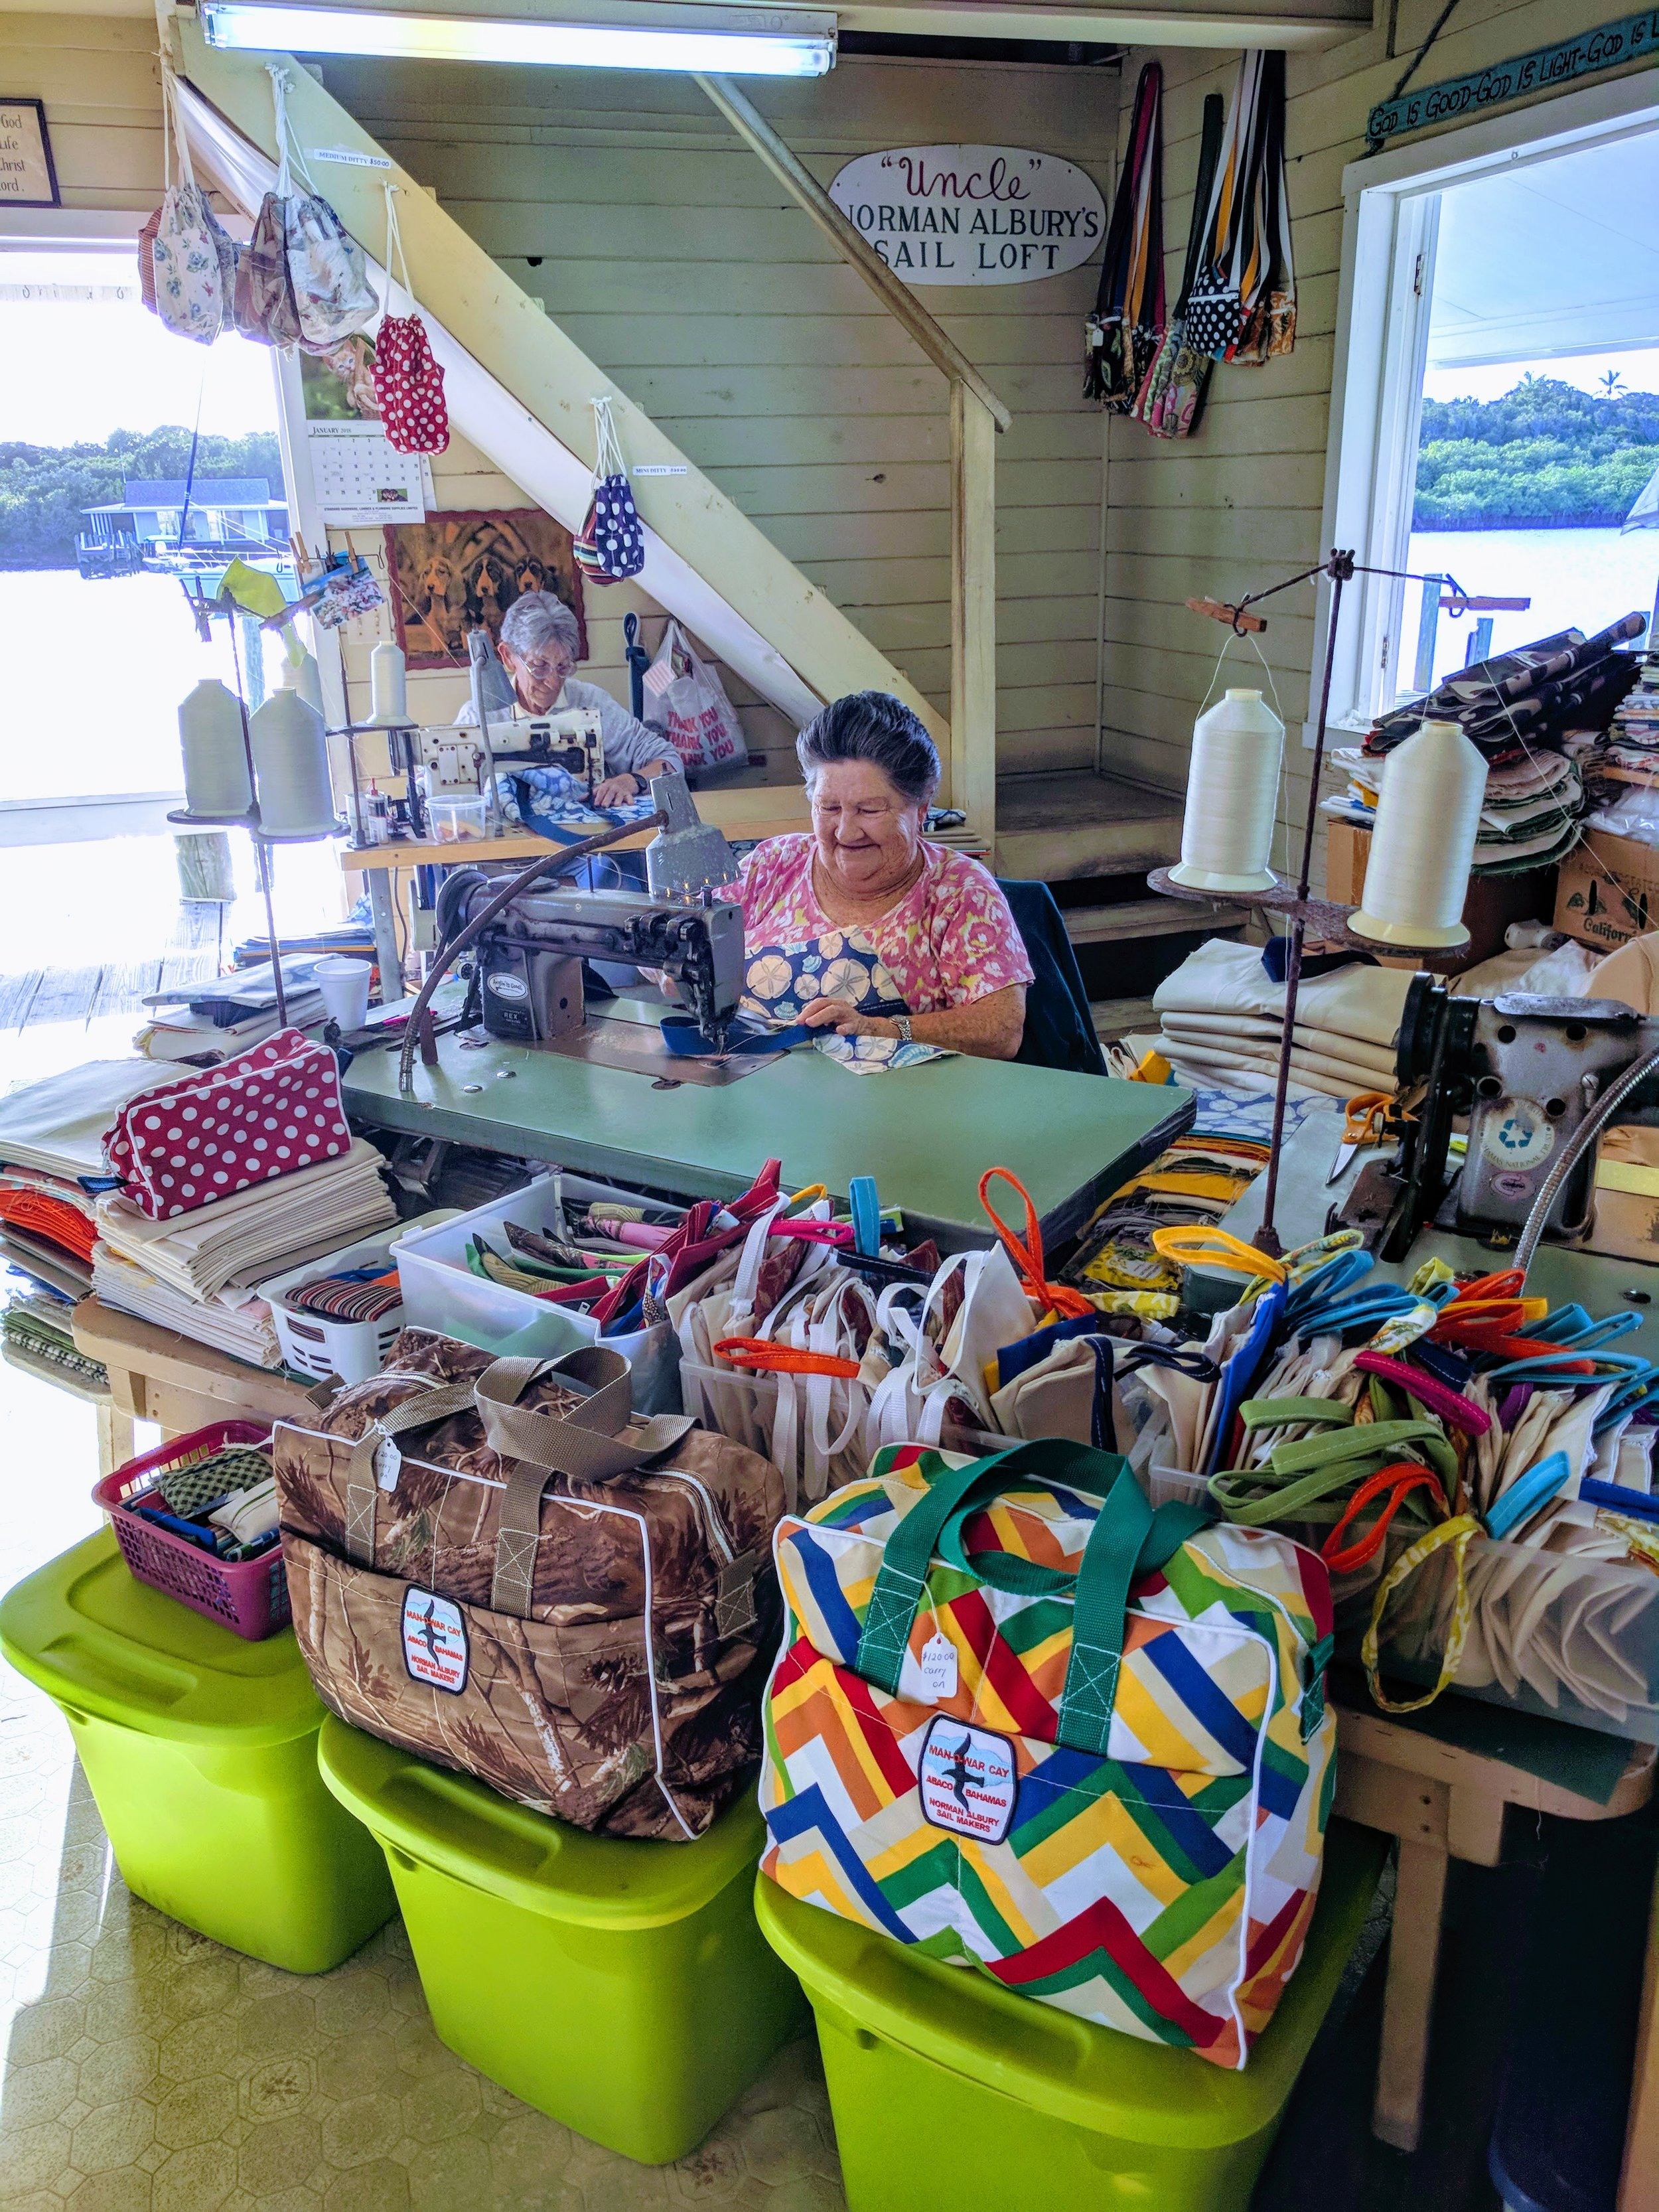 Ladies at work sewing at Albury Sail Shop.